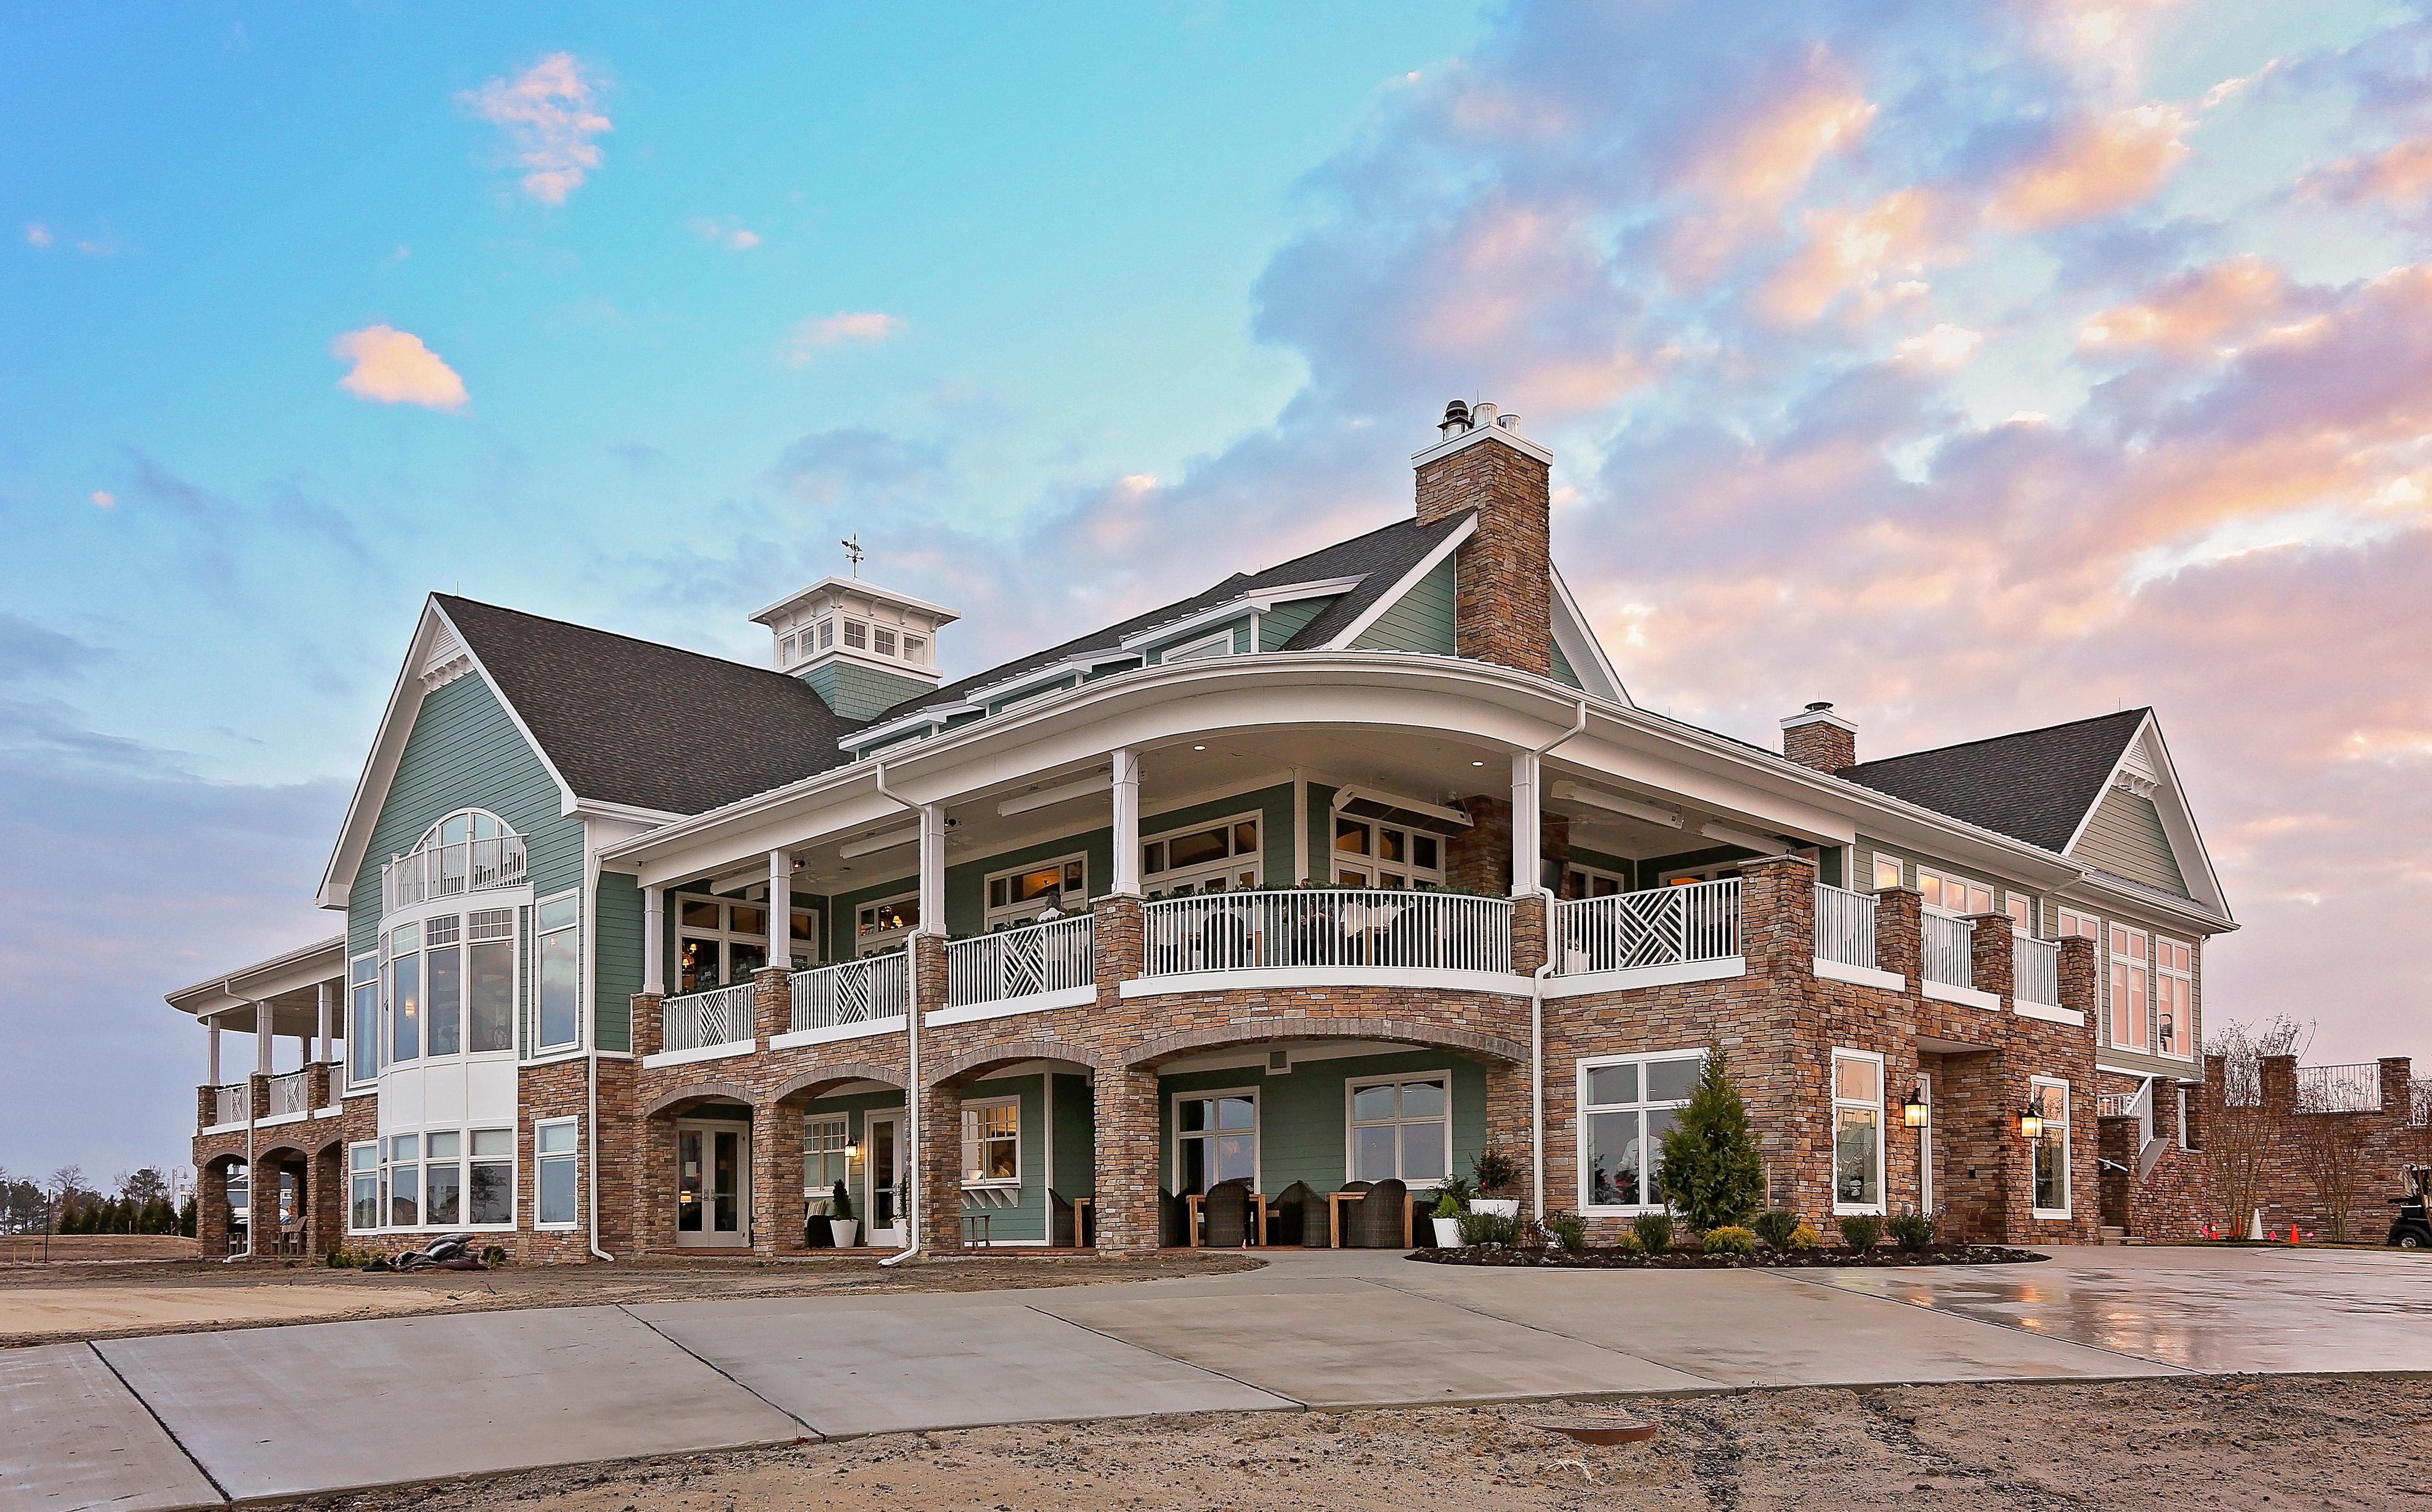 Peninsula clubhouse